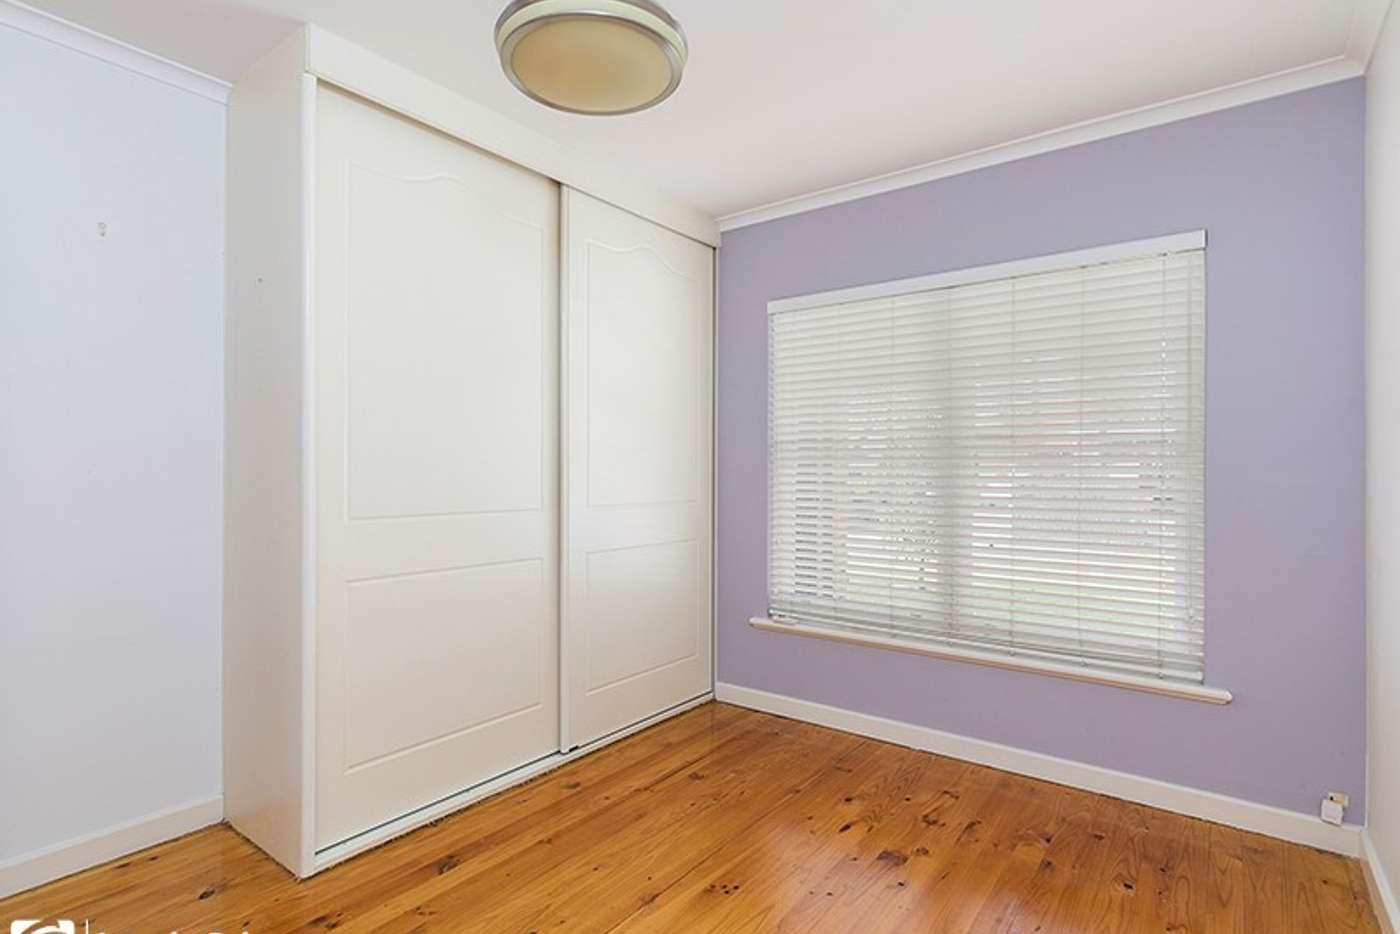 Seventh view of Homely unit listing, 3/35 Augusta Street, Glenelg SA 5045